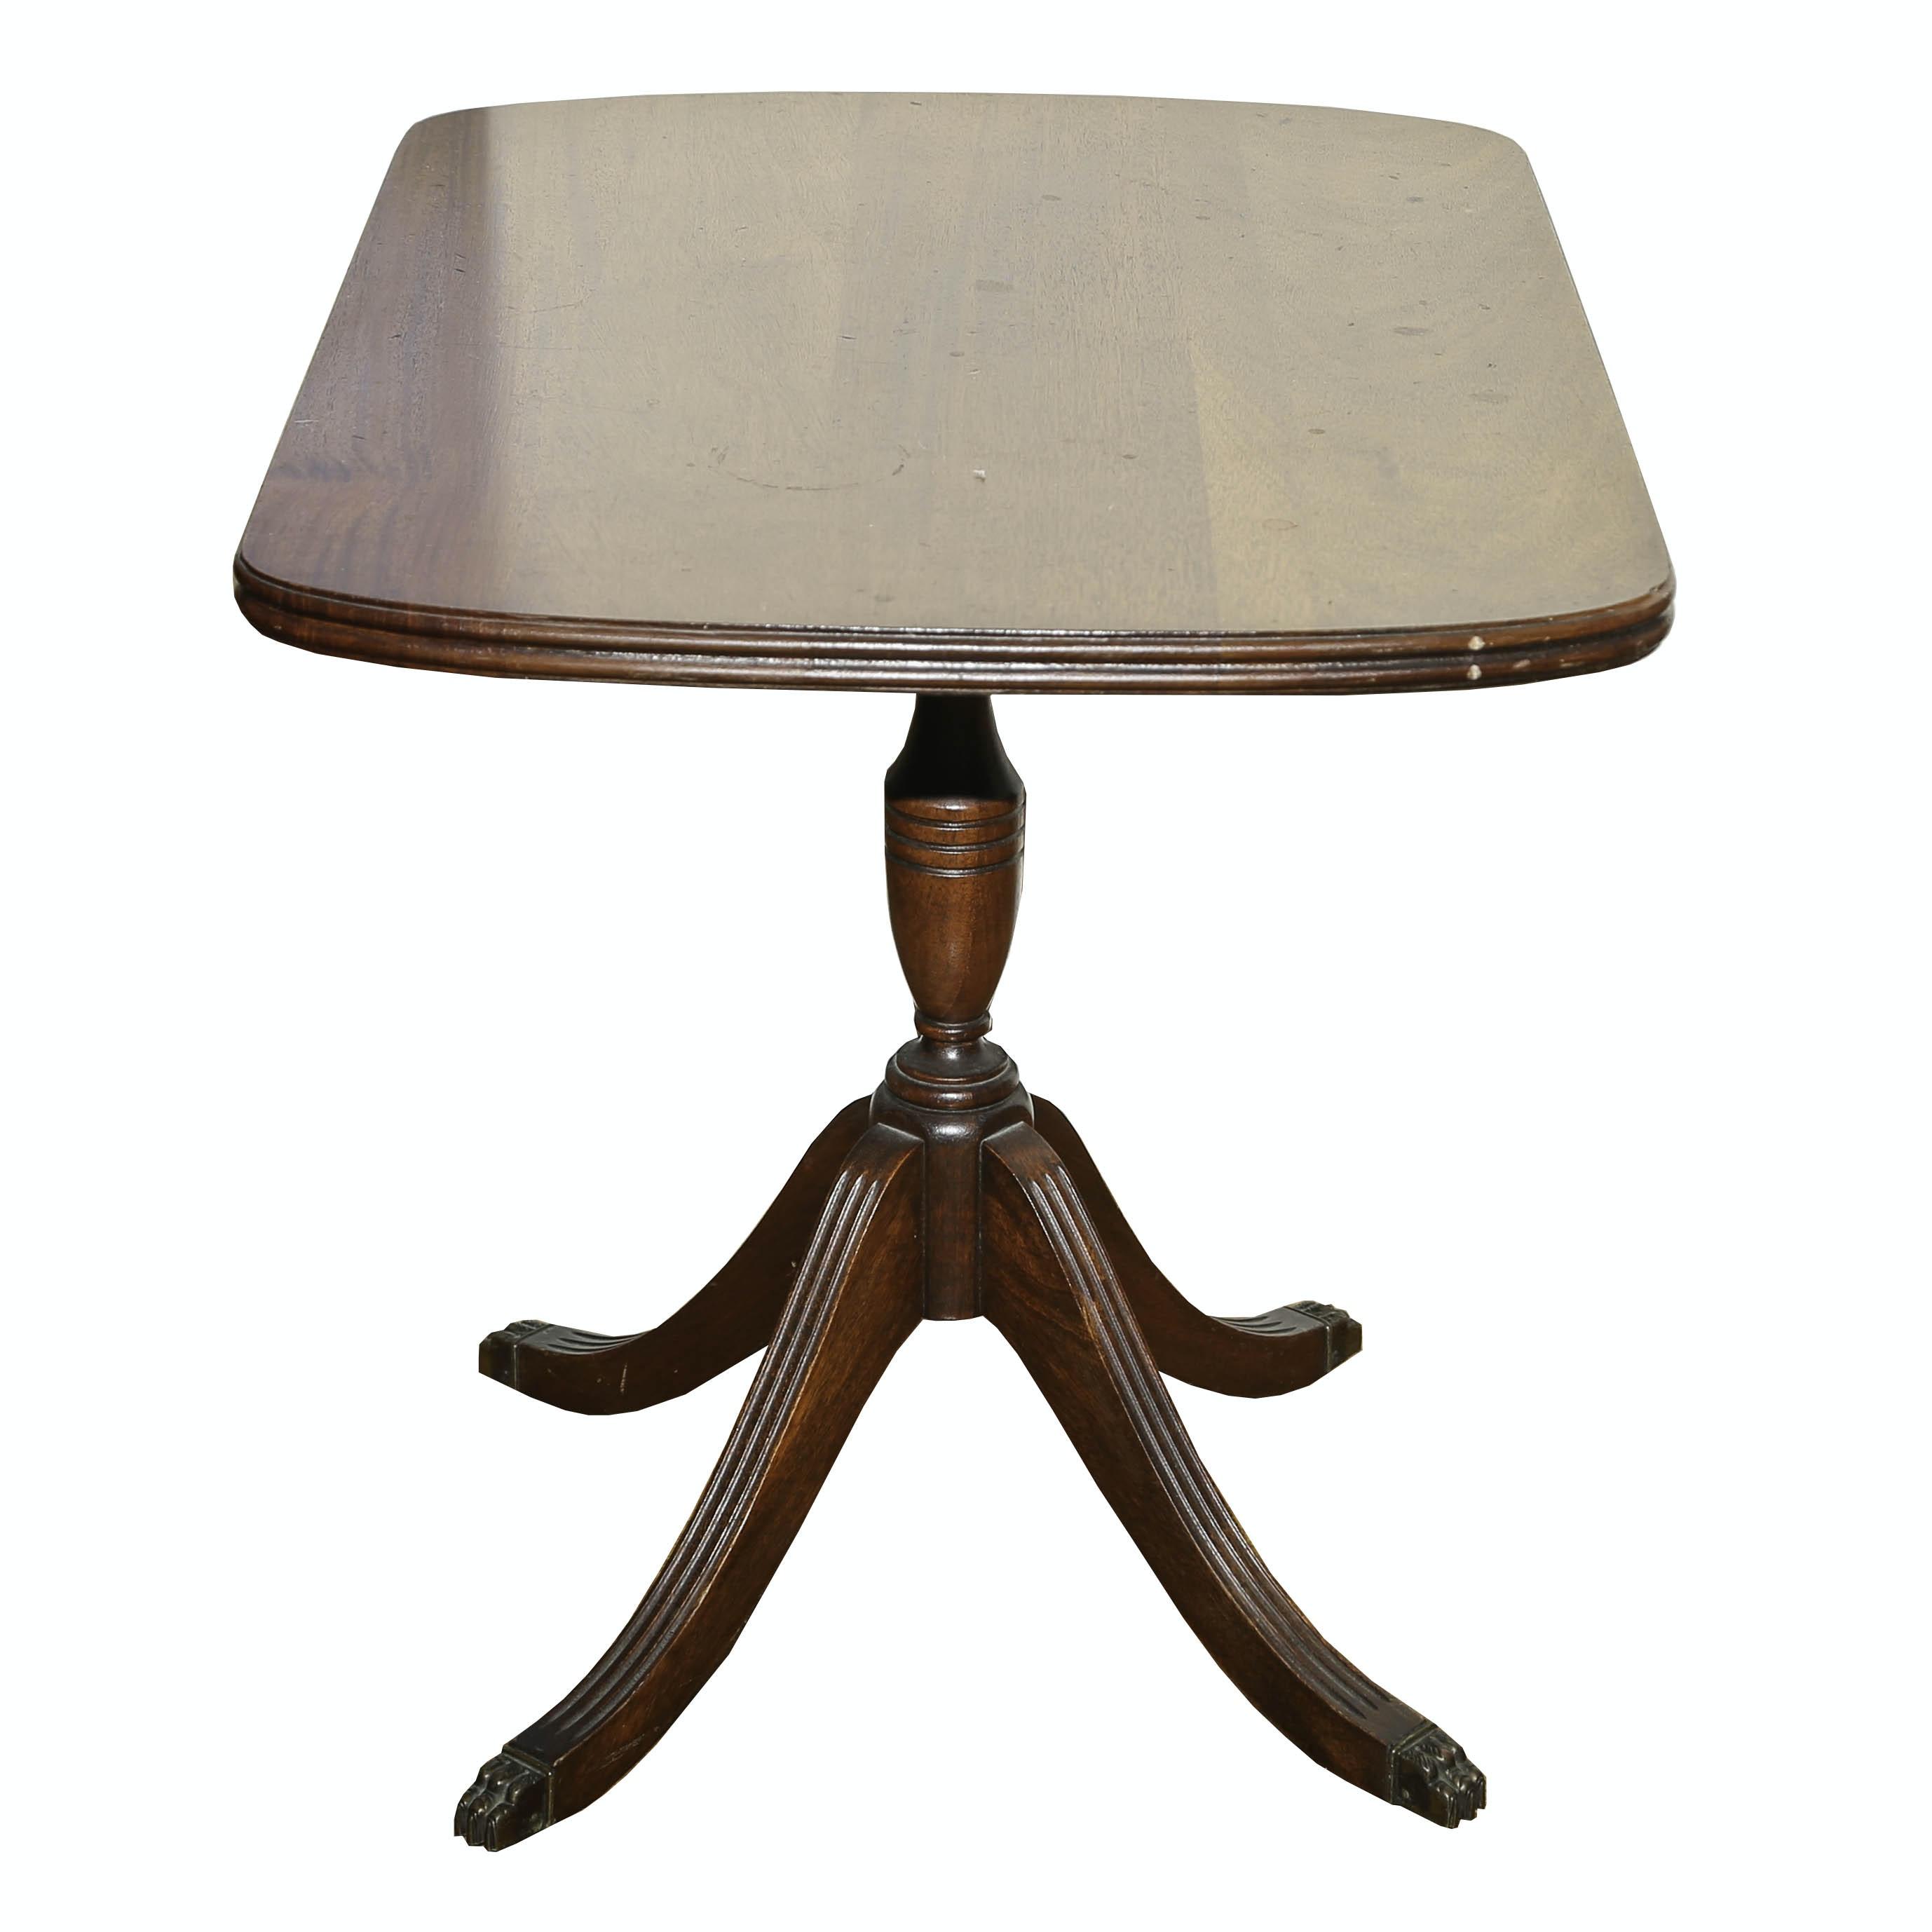 Eastlake Style Side Table